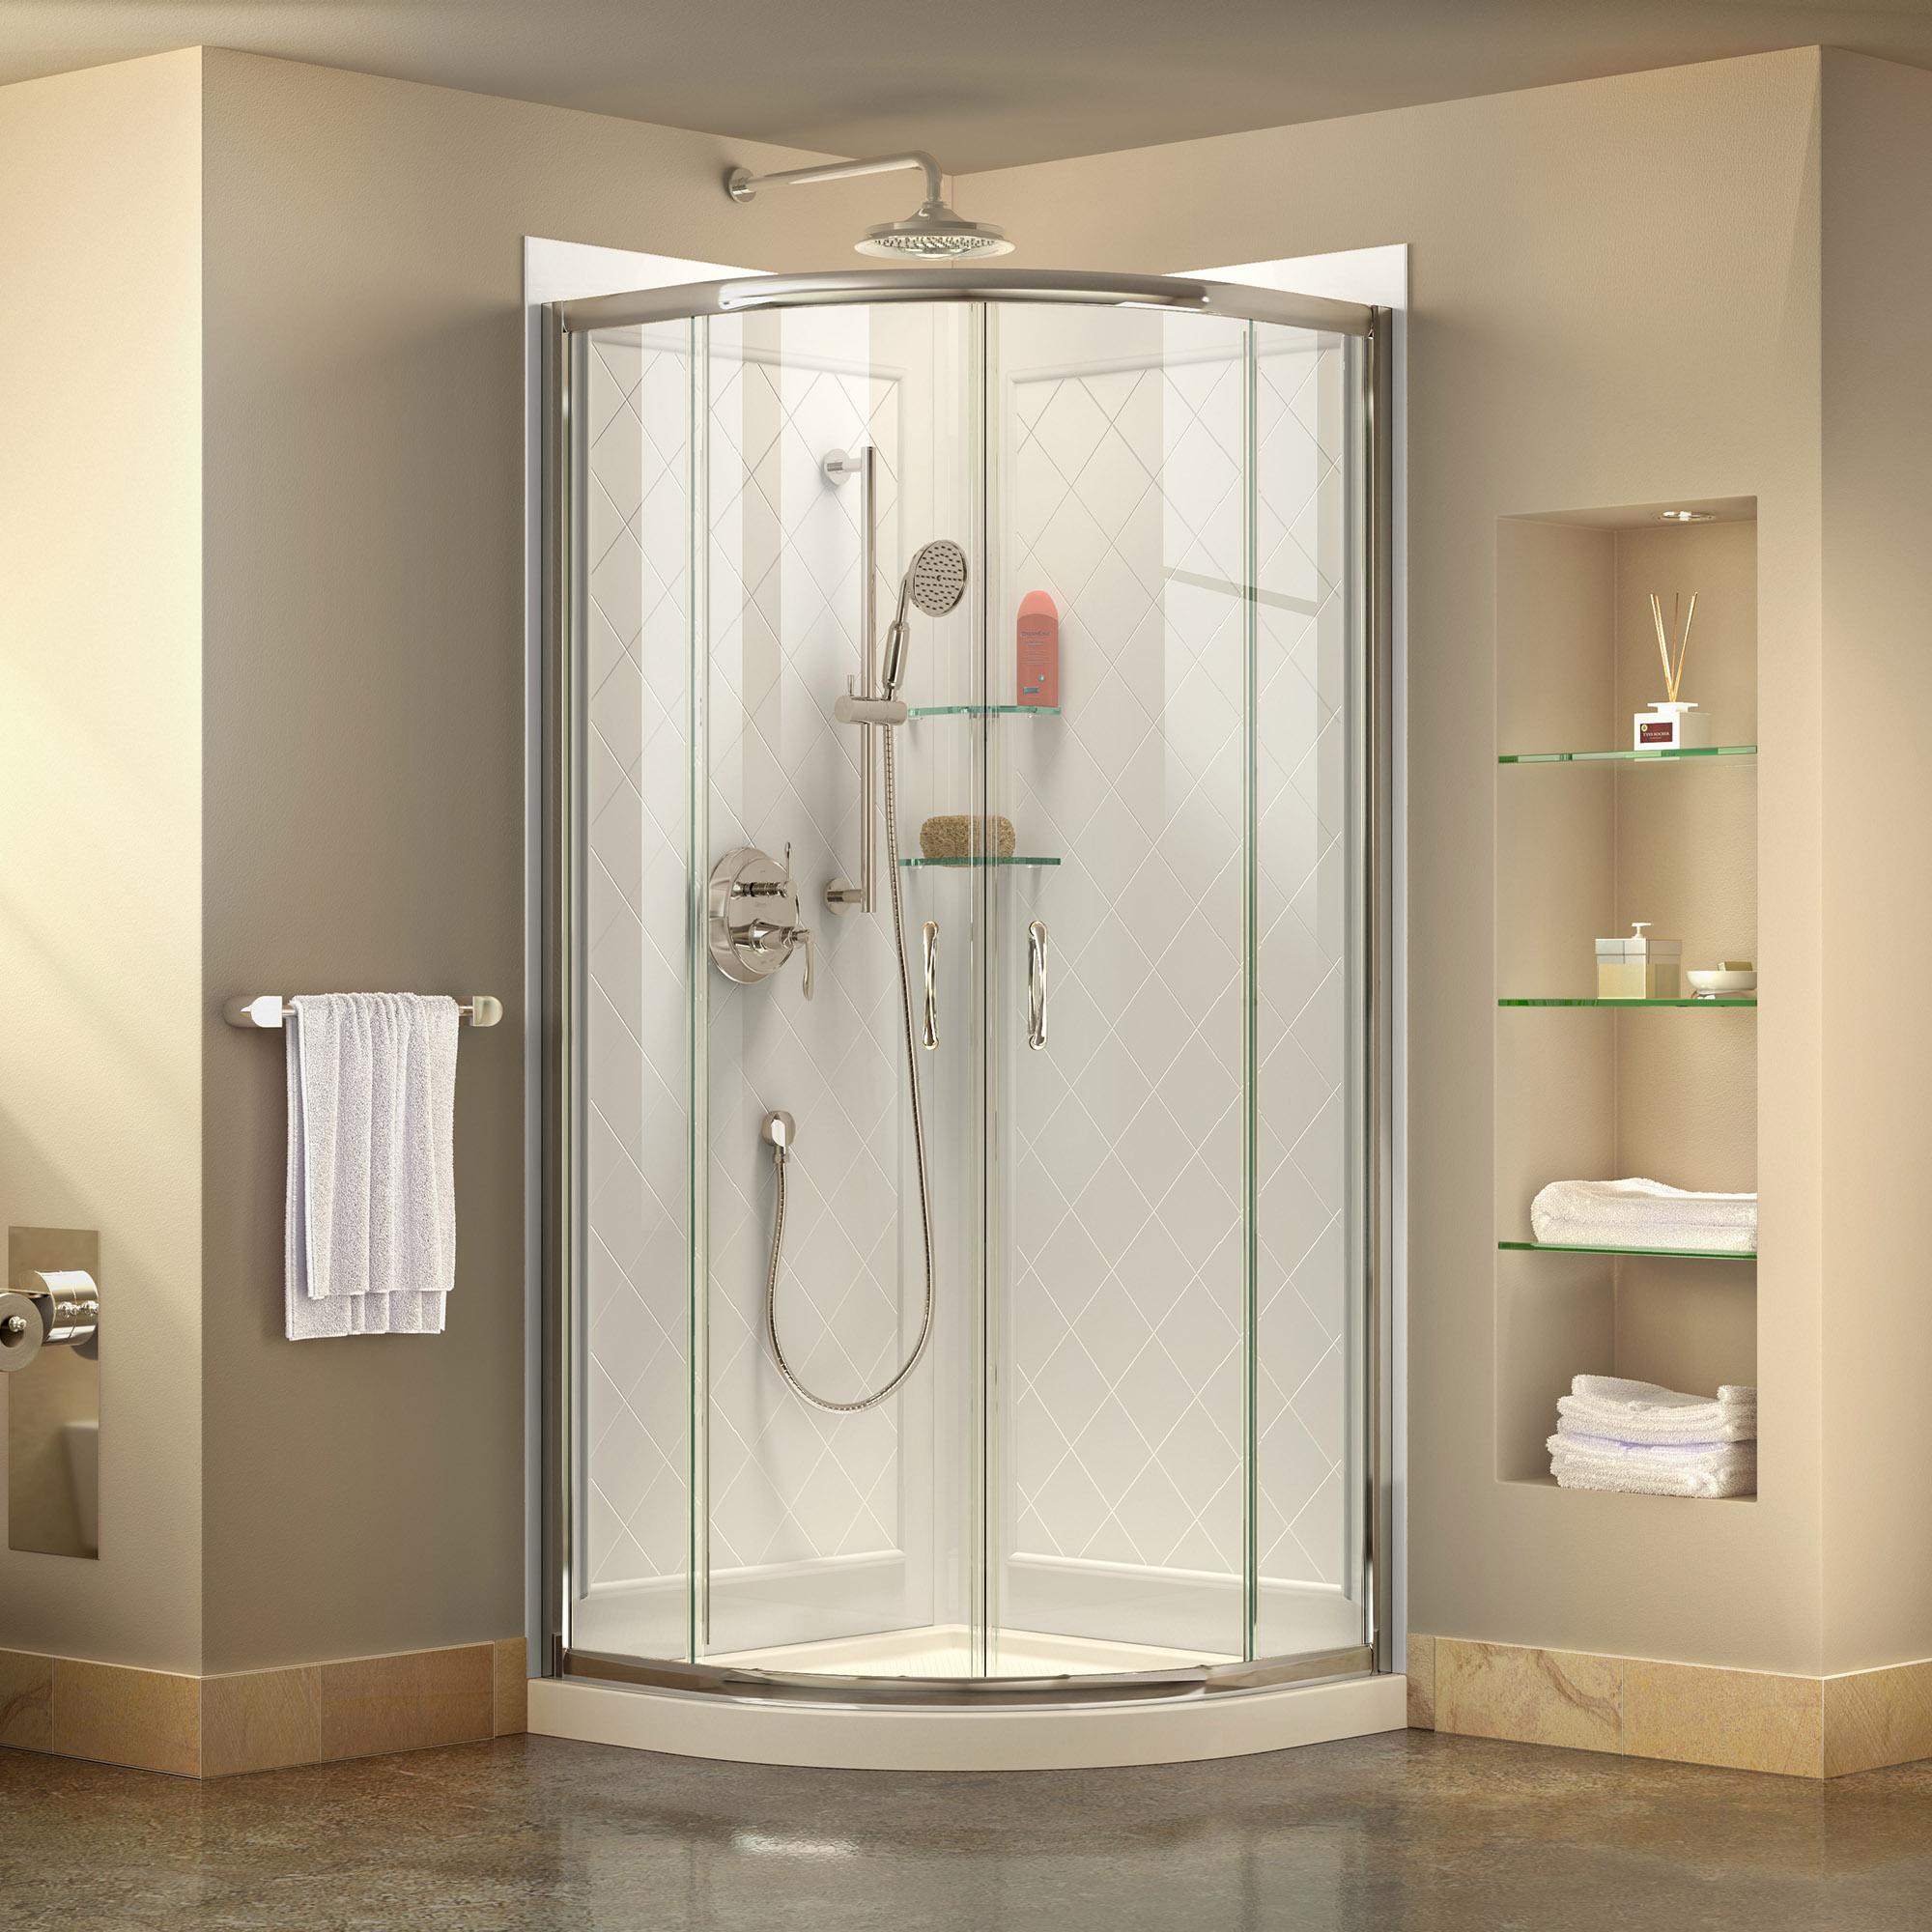 "Prime 31 3/8"" by 31 3/8"" Frameless Sliding Shower Enclosure, Base & QWALL-4 Shower Backwall Kit"